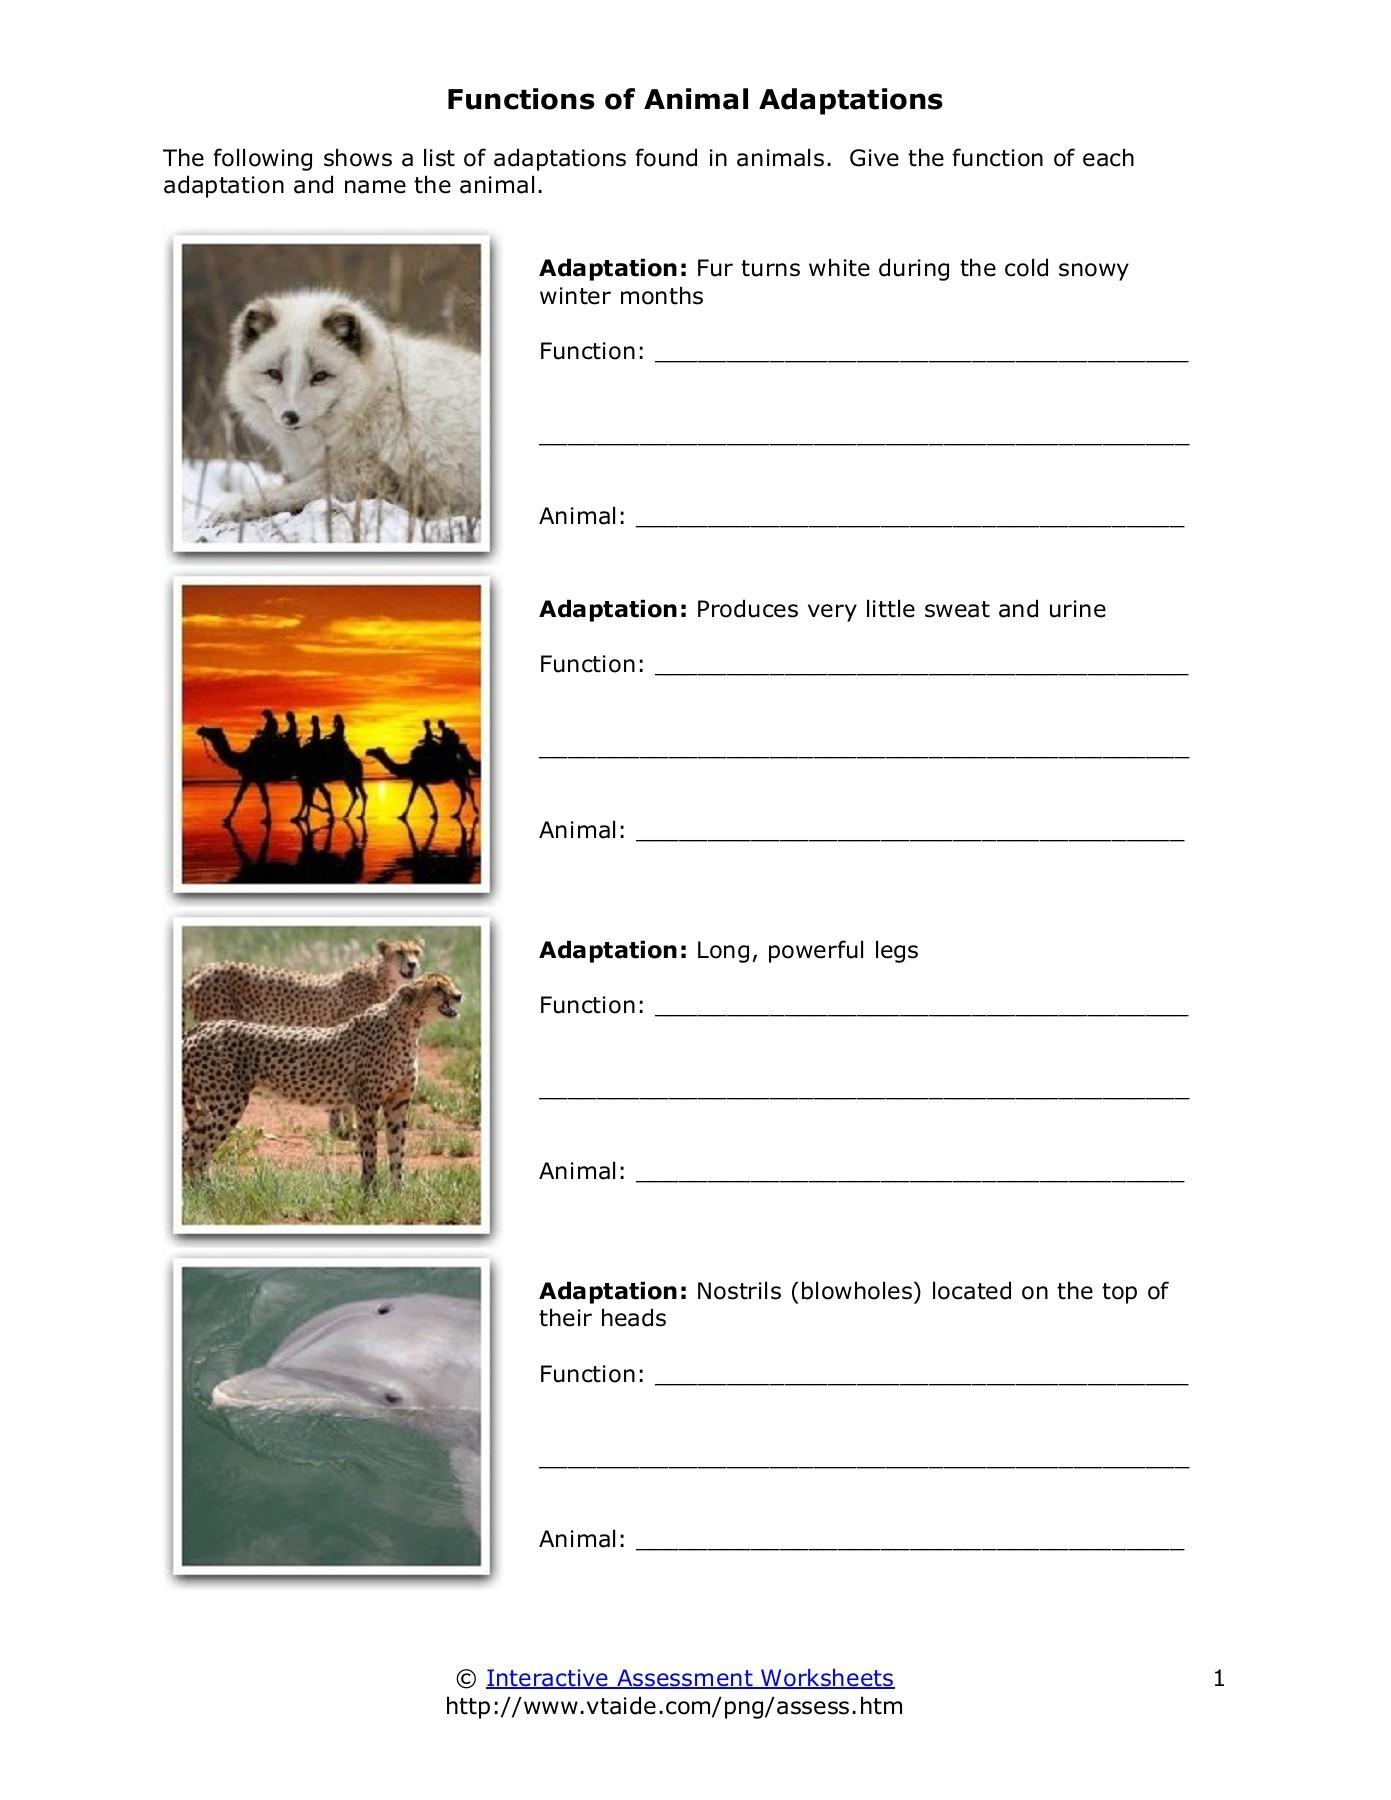 Functions of Animal Adaptations.